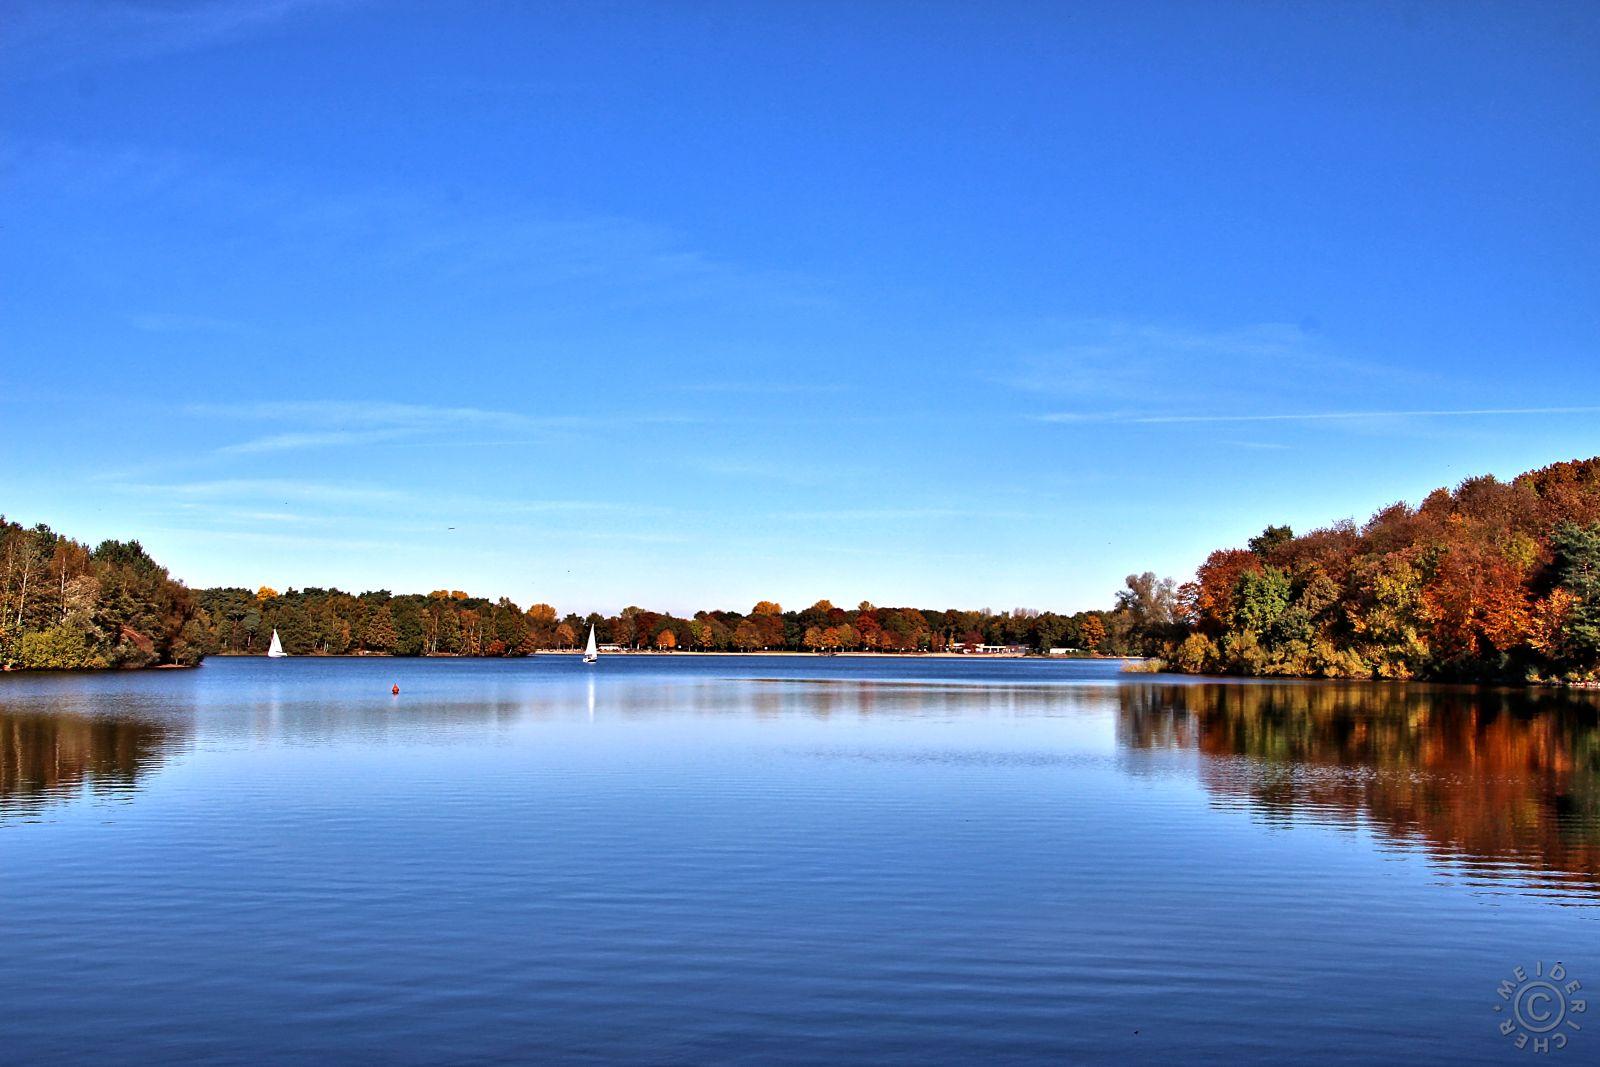 Herbstimpressionen: Sechs Seen Platte 611